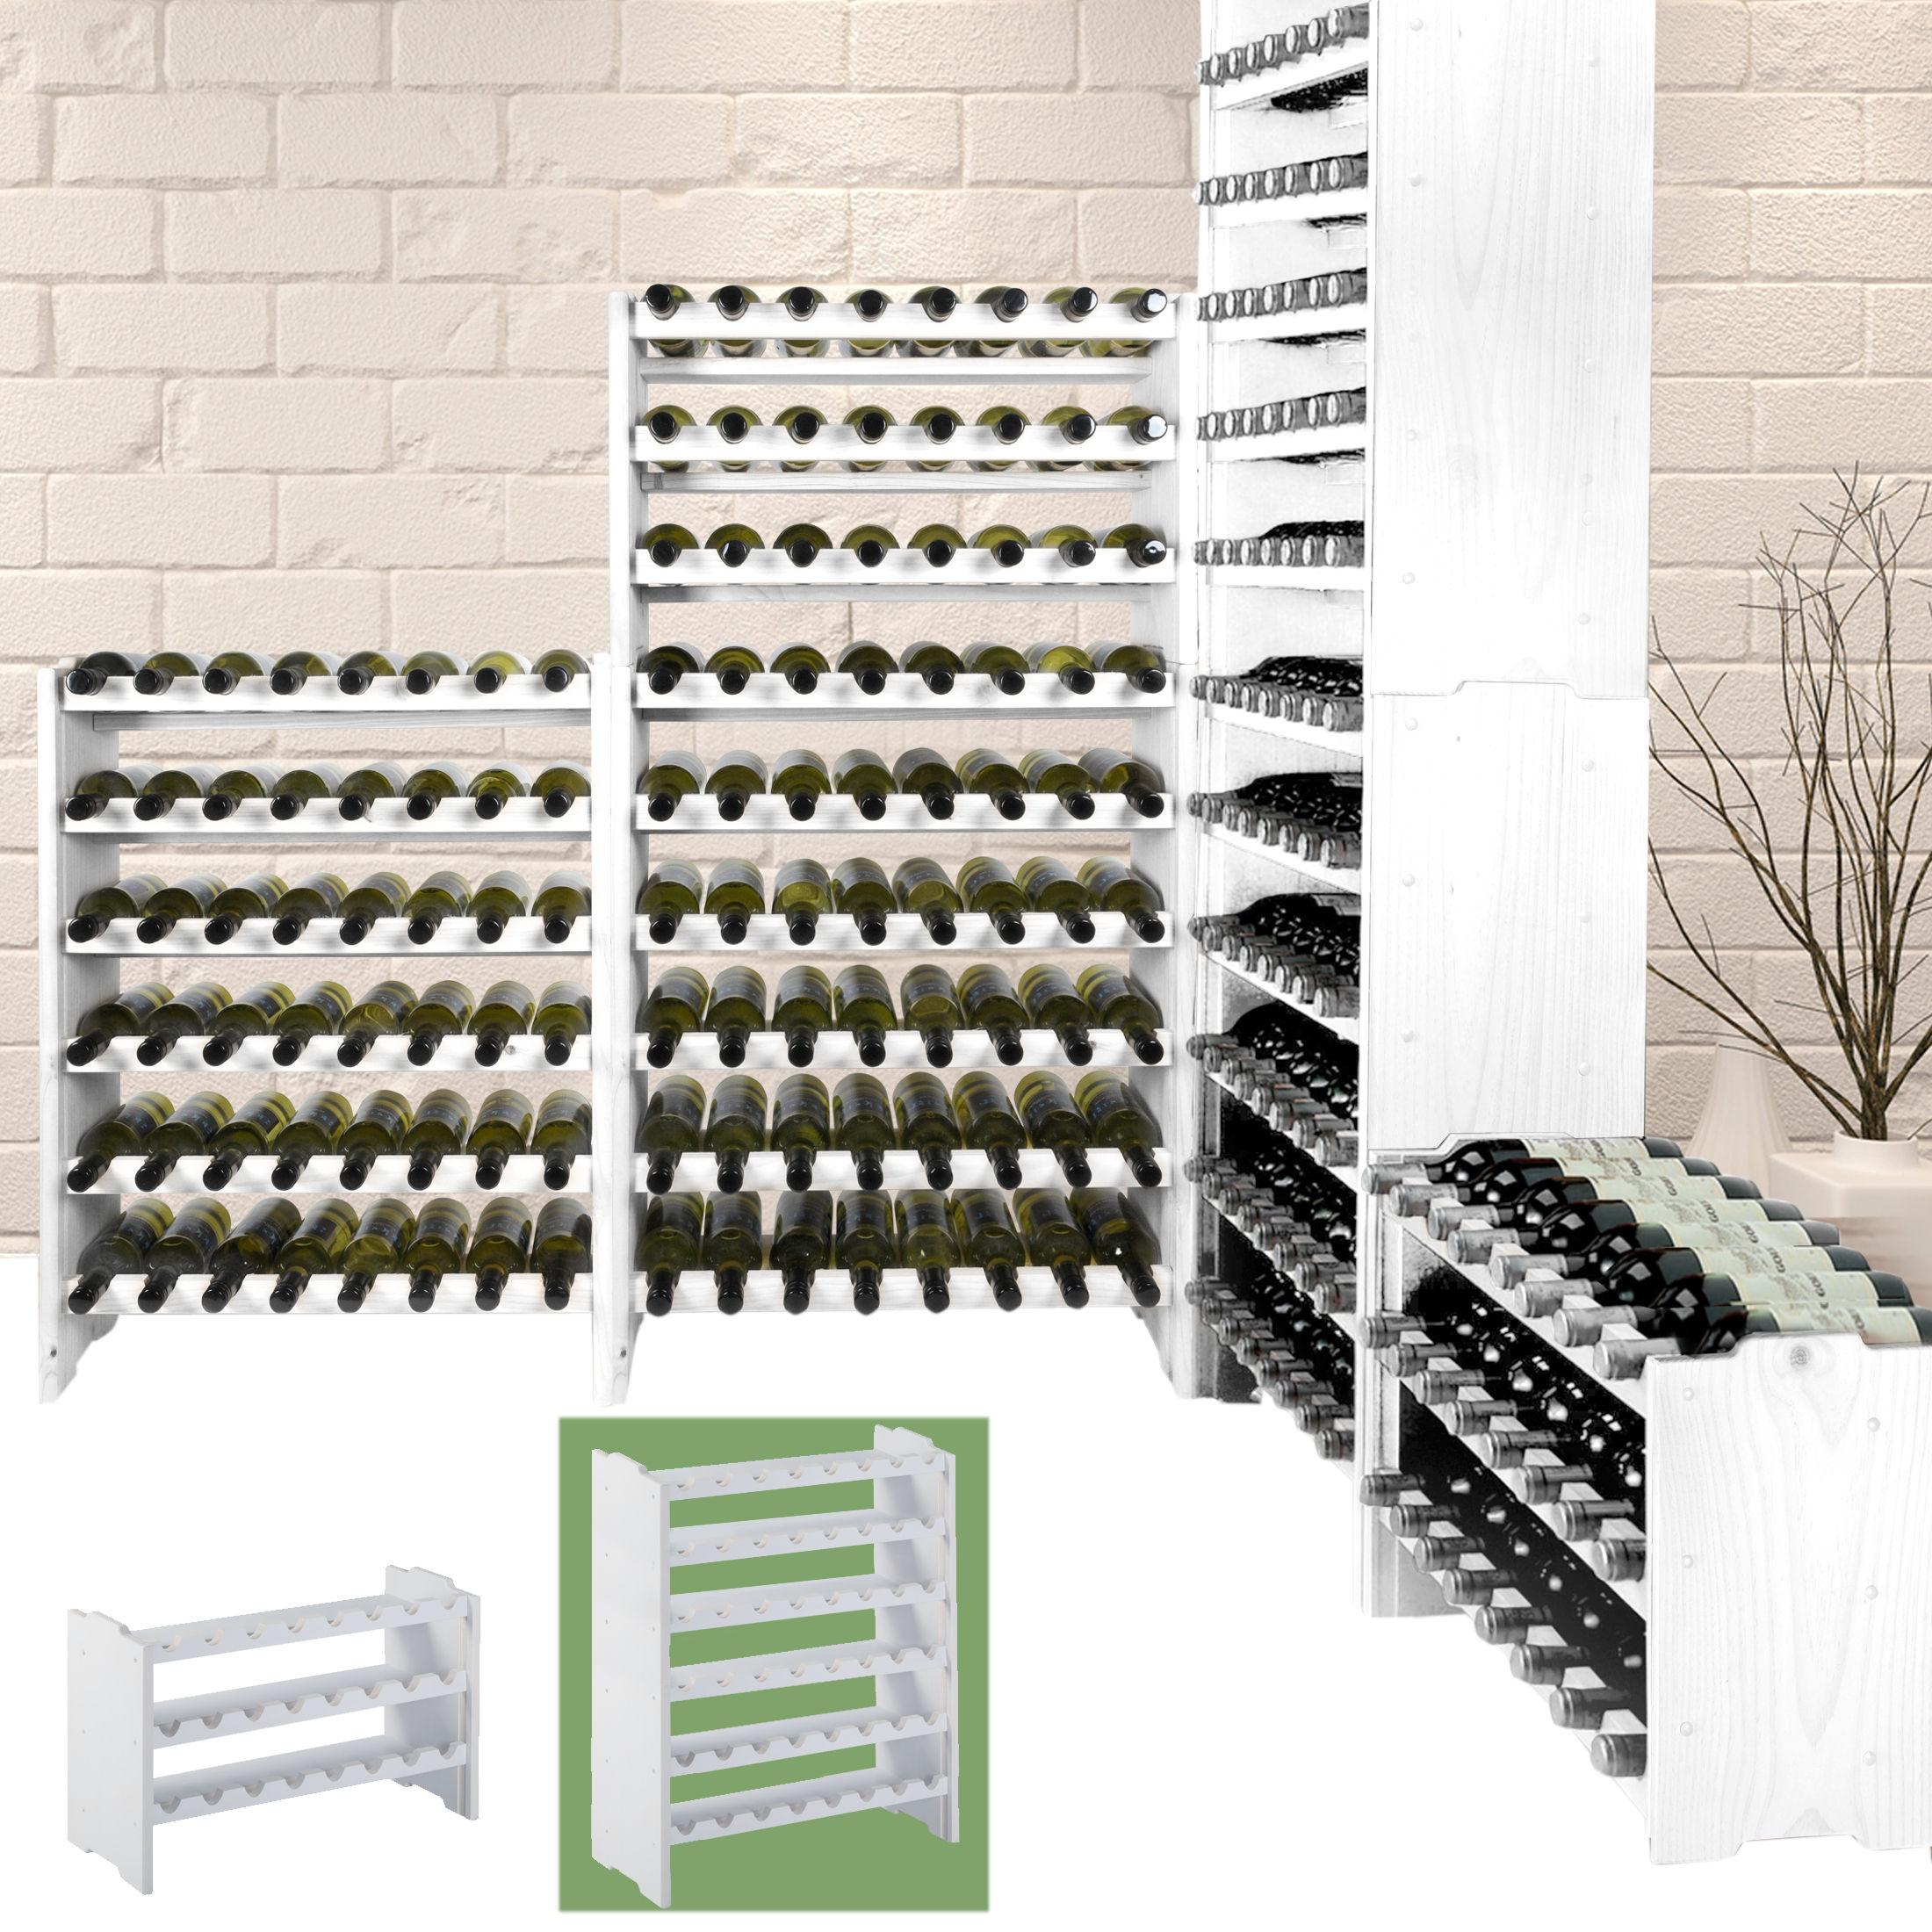 weinregal system medoc holz kiefer wei stapelbar erweiterbar. Black Bedroom Furniture Sets. Home Design Ideas